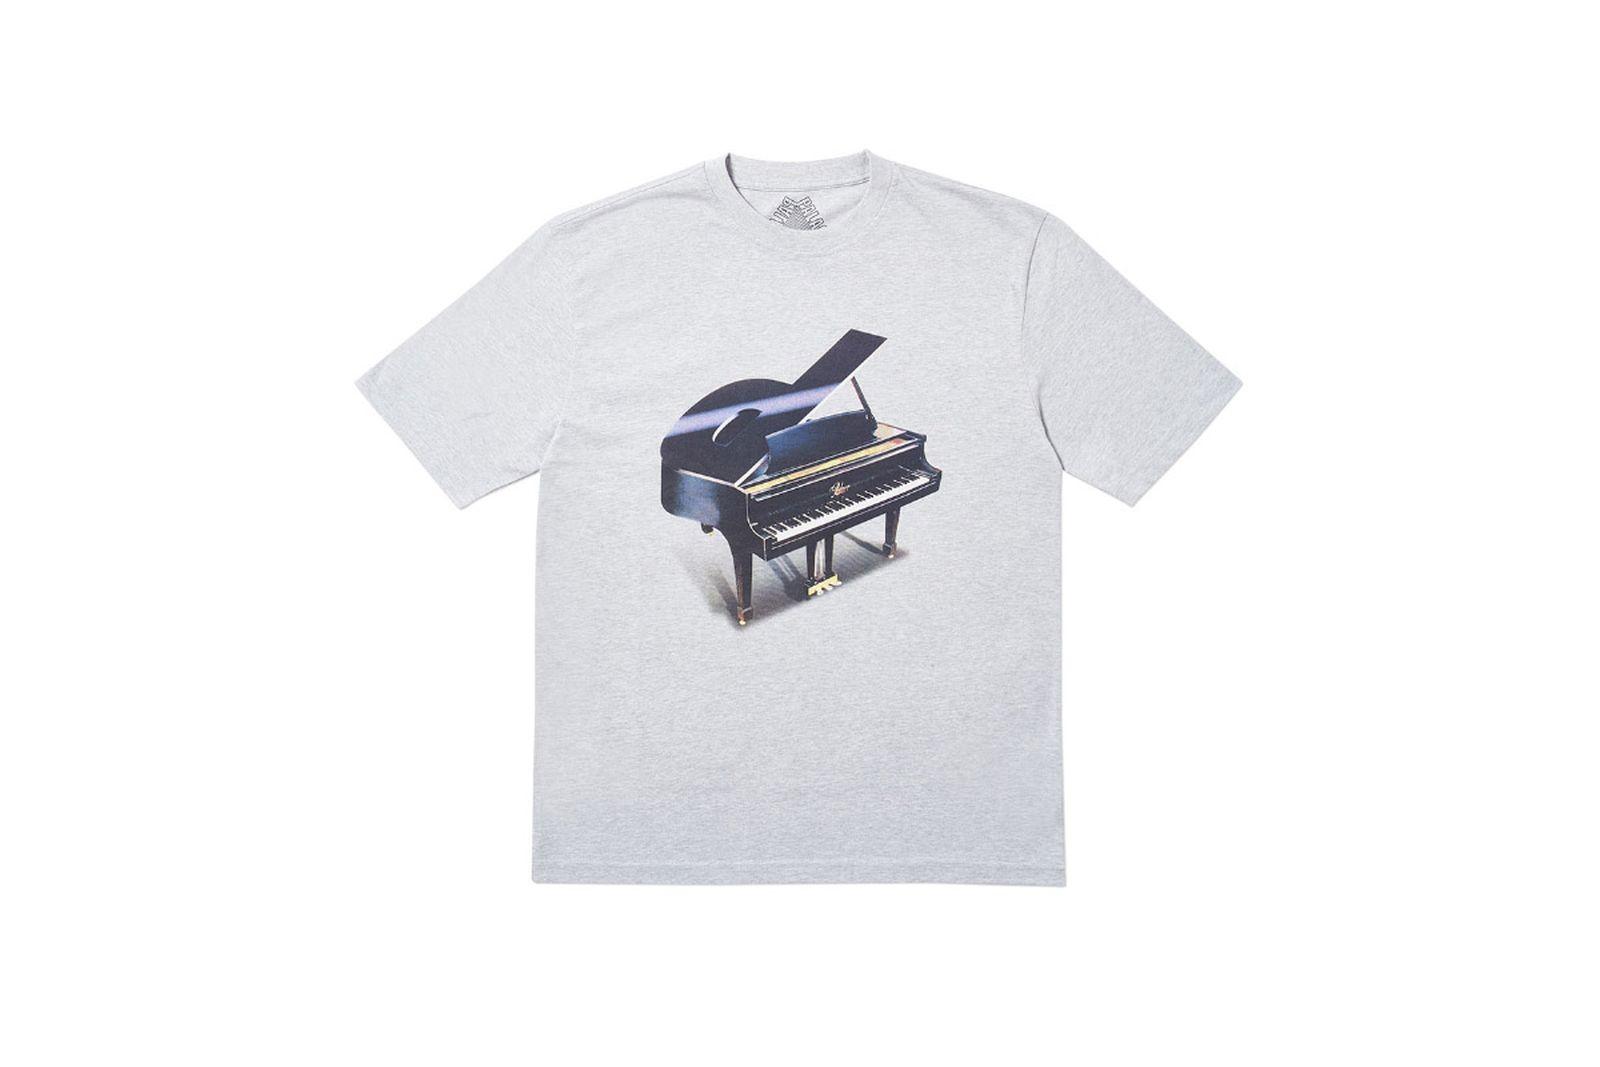 Palace 2019 Autumn T Shirt Grand white